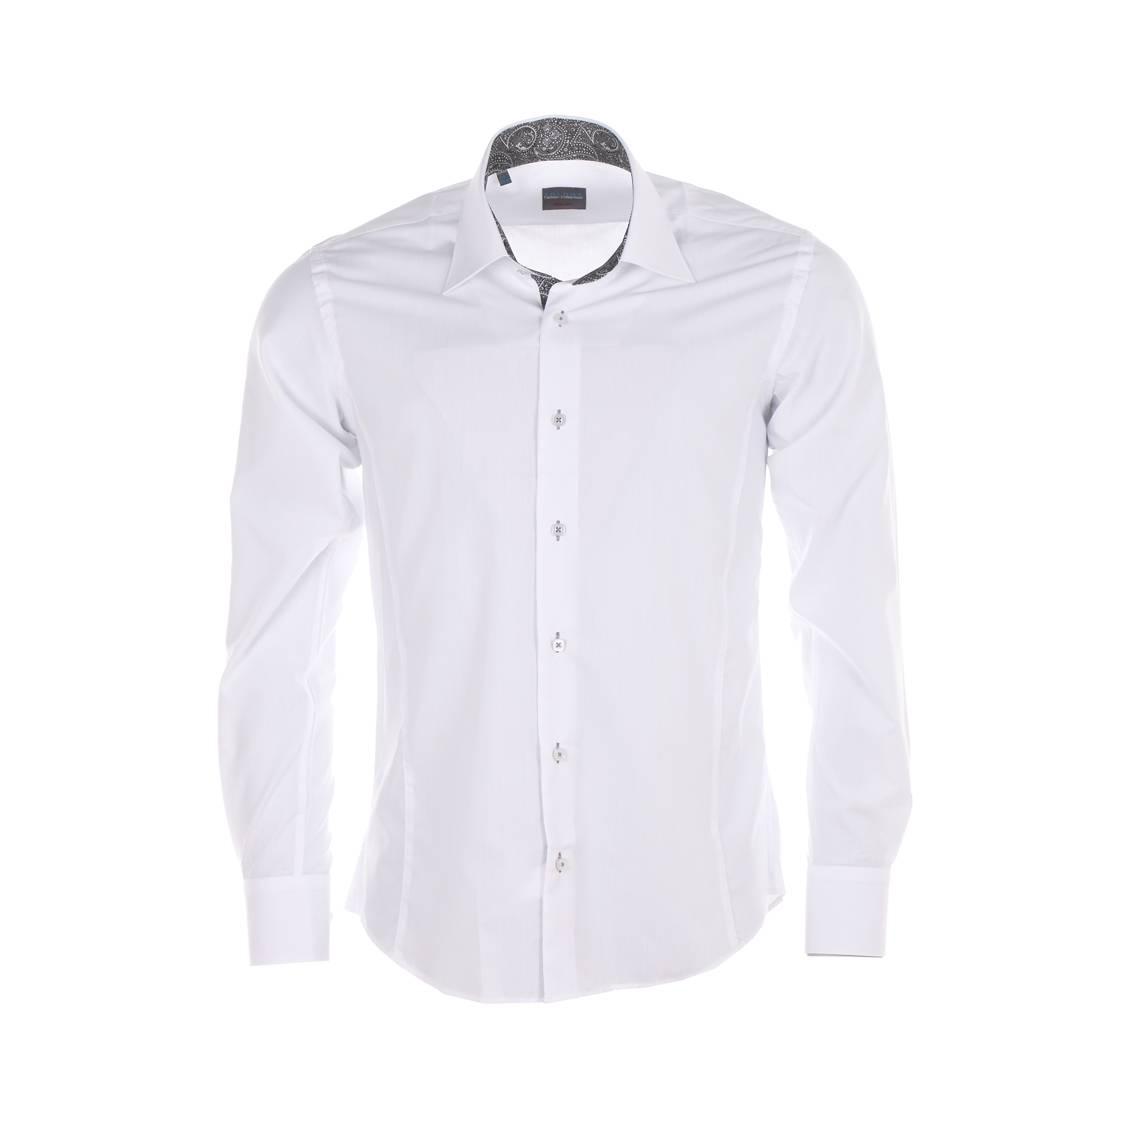 Chemise droite  blanche, à opposition cachemire